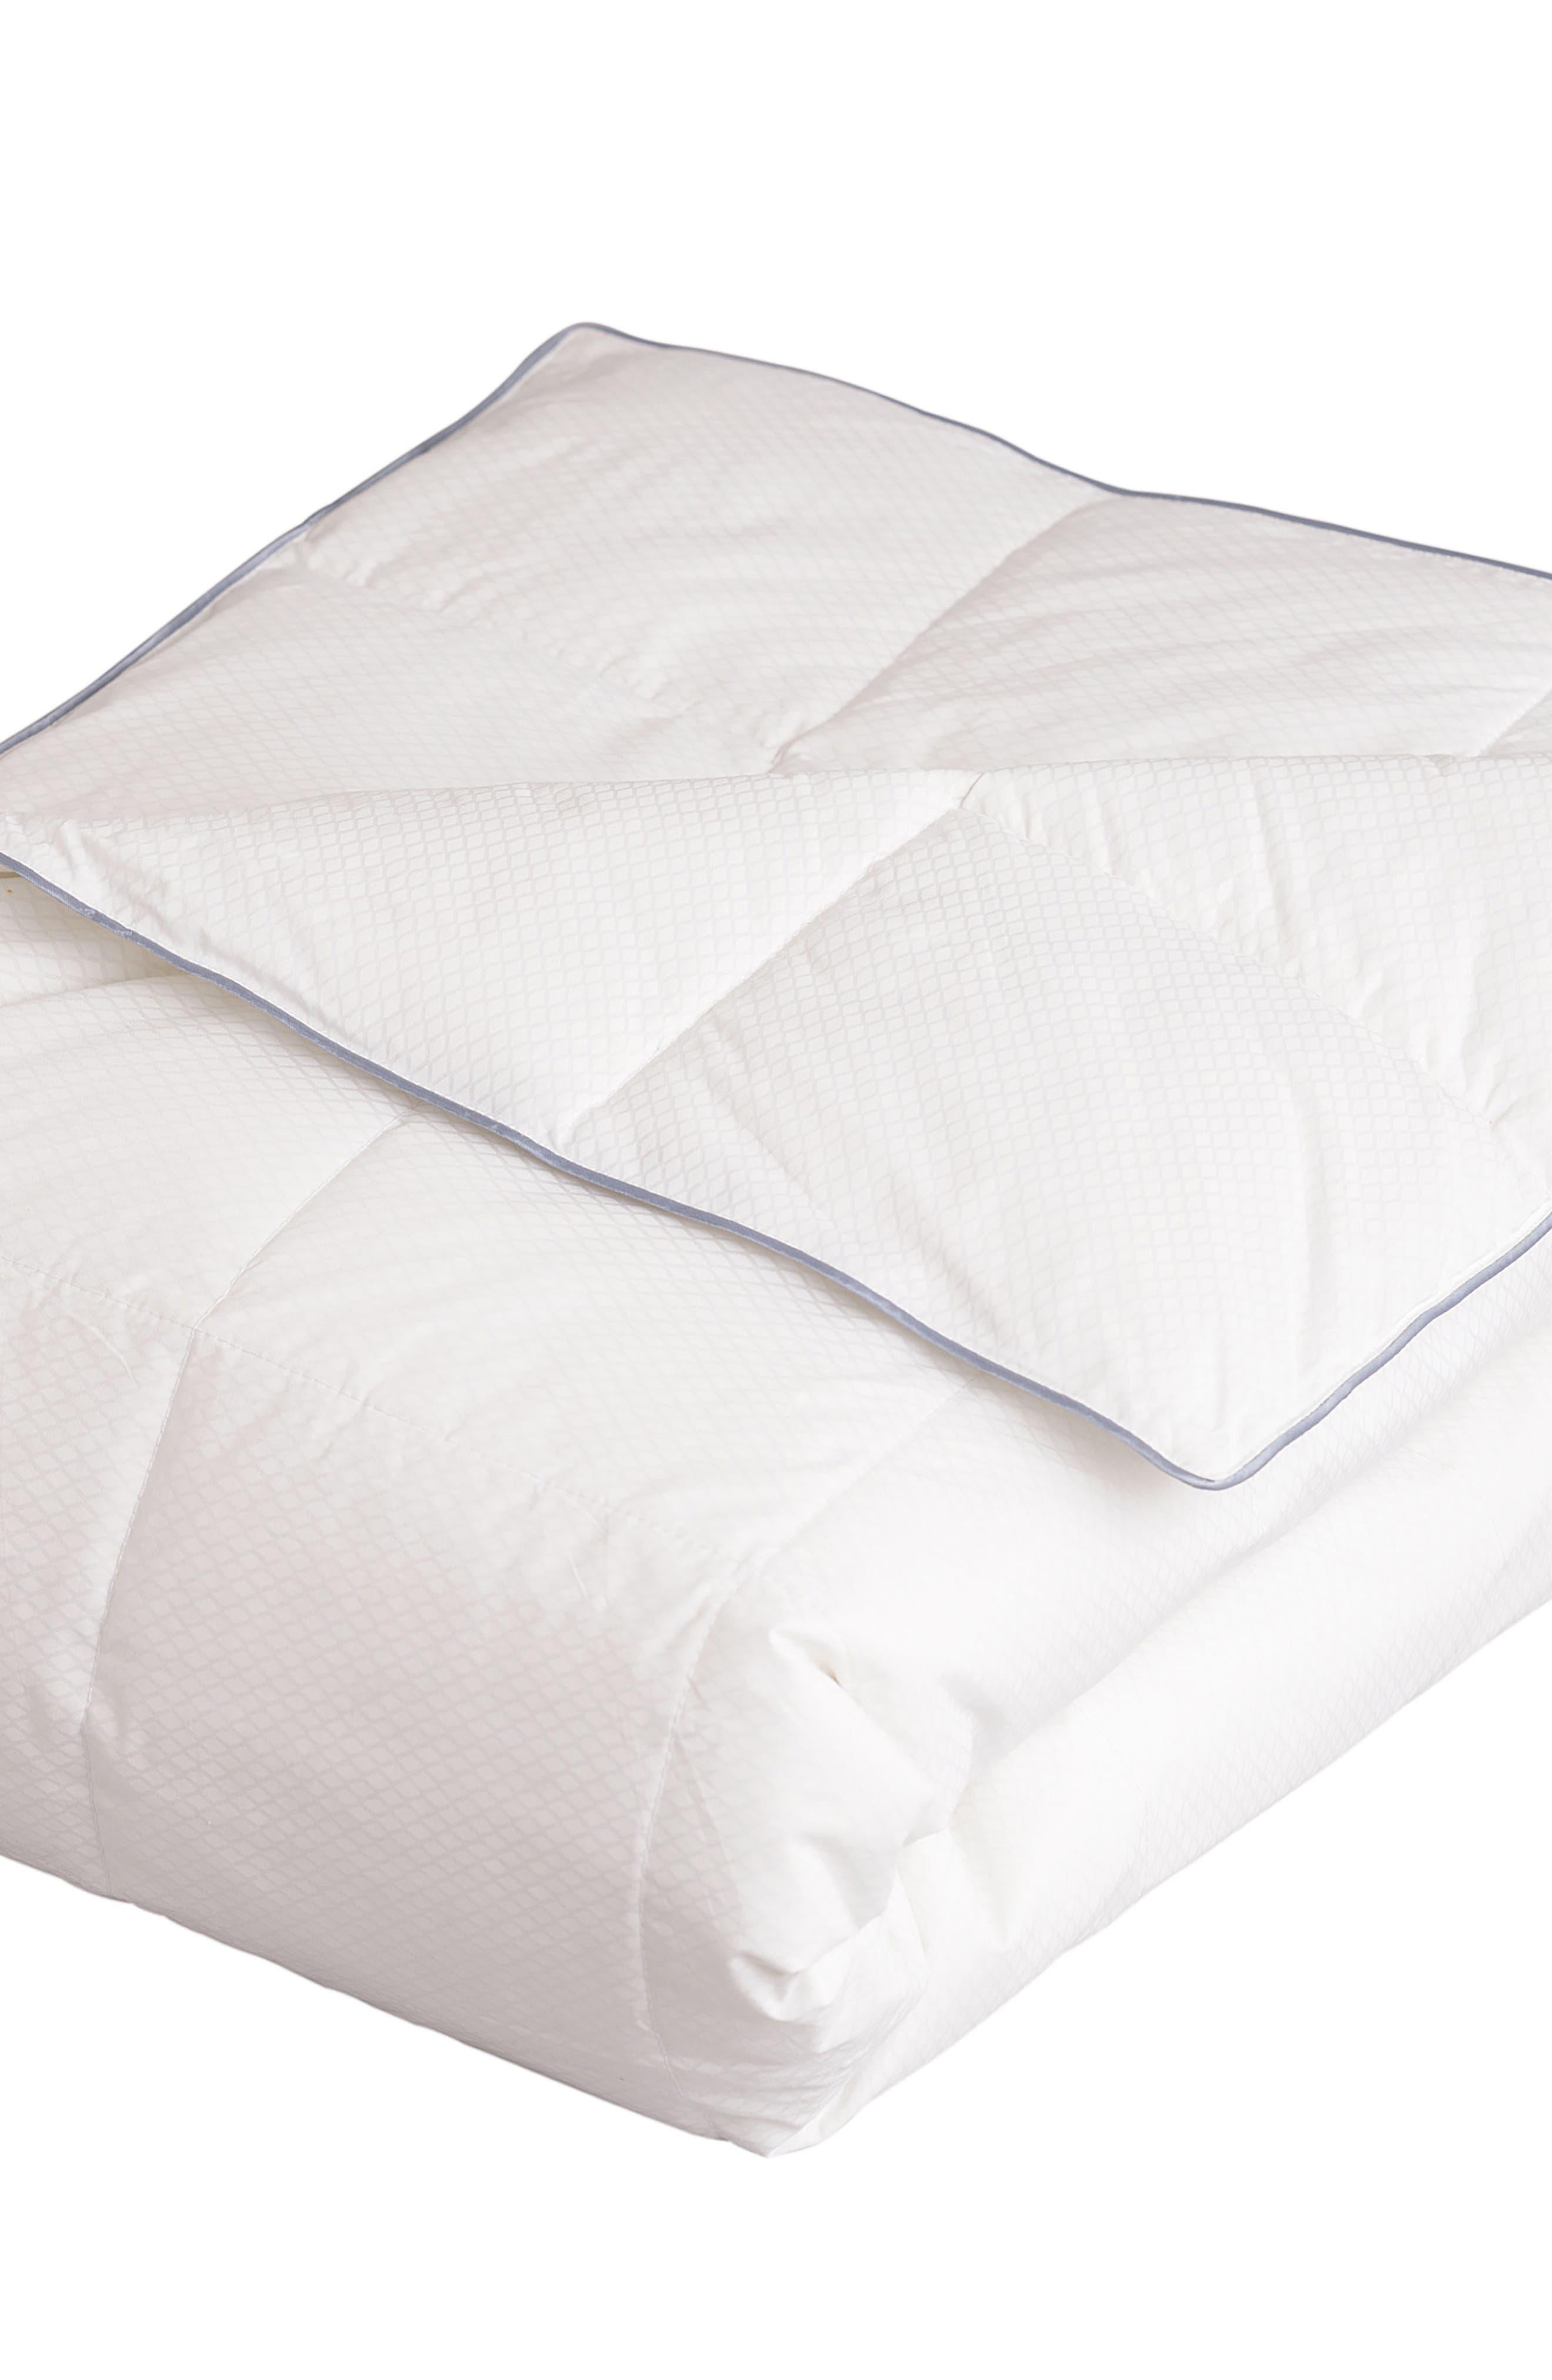 Blanket,                         Main,                         color, White